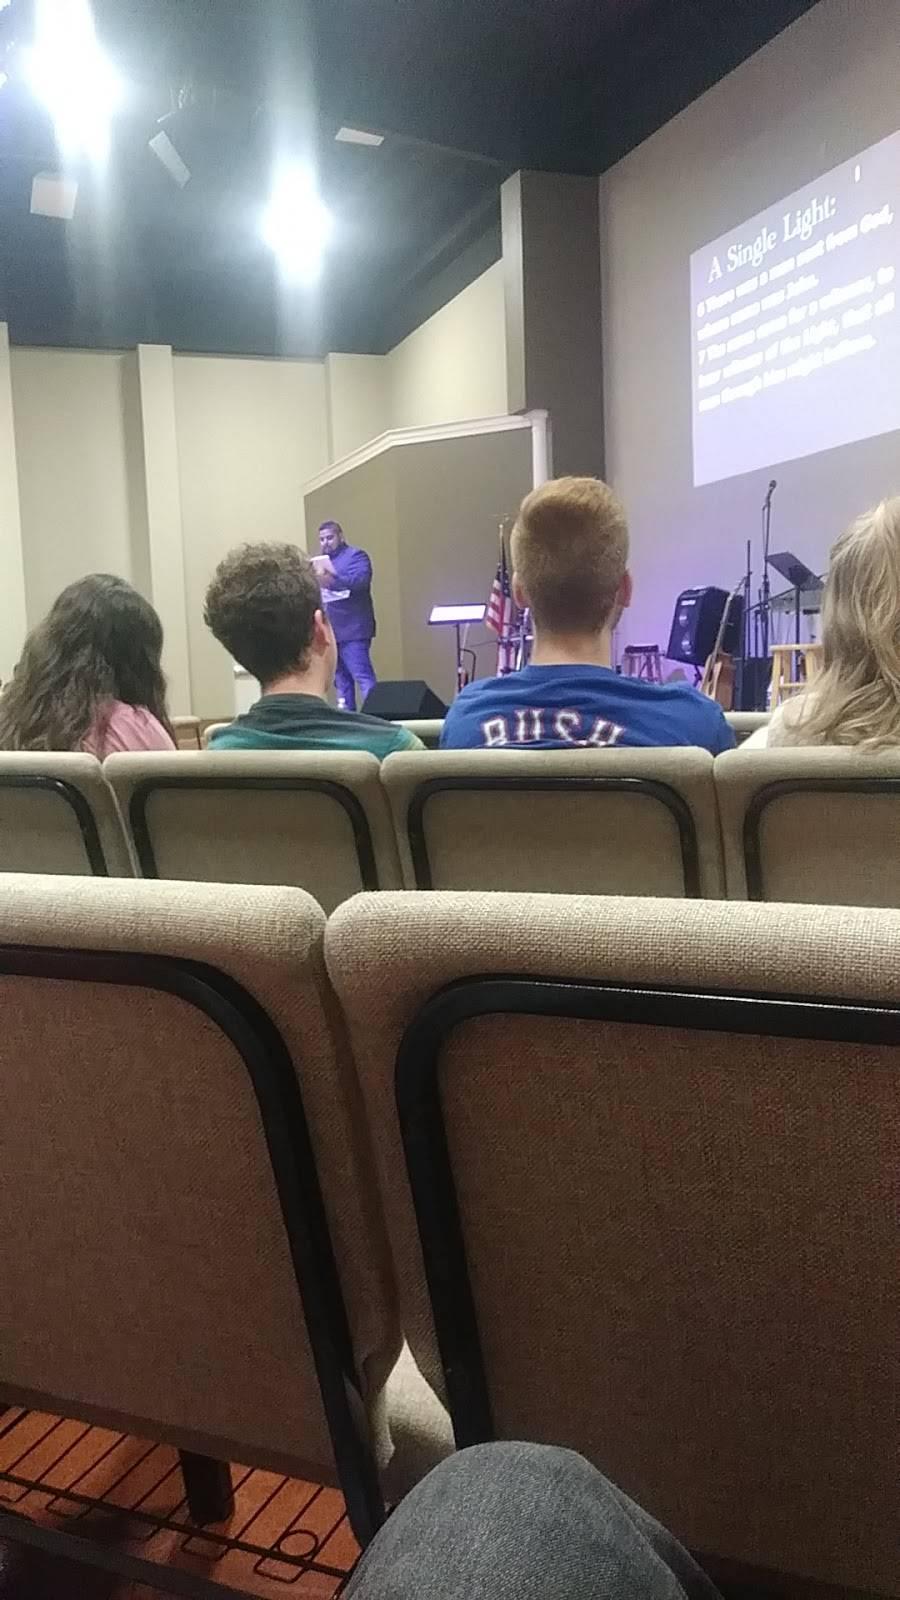 Southpointe Baptist Church - church  | Photo 5 of 7 | Address: 901 Debbie Ln, Arlington, TX 76002, USA | Phone: (817) 453-5550